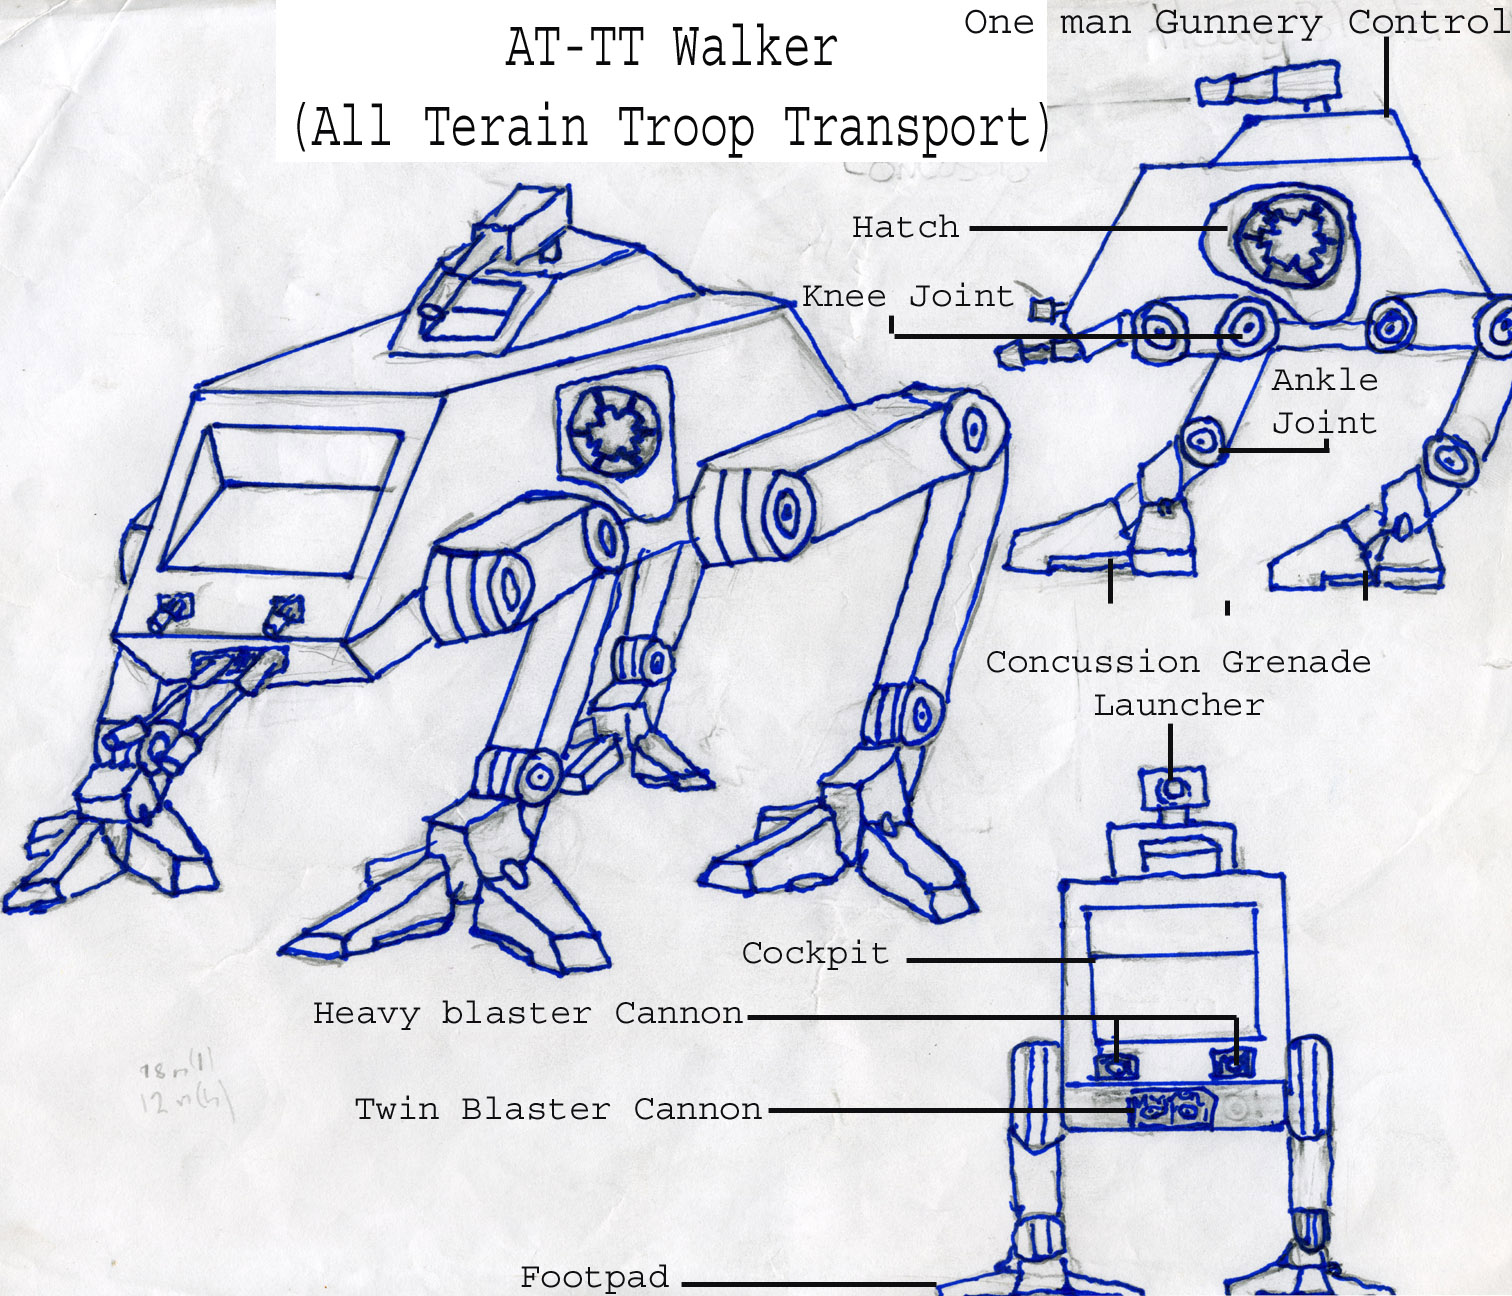 Allegiance - AT-TT Walker